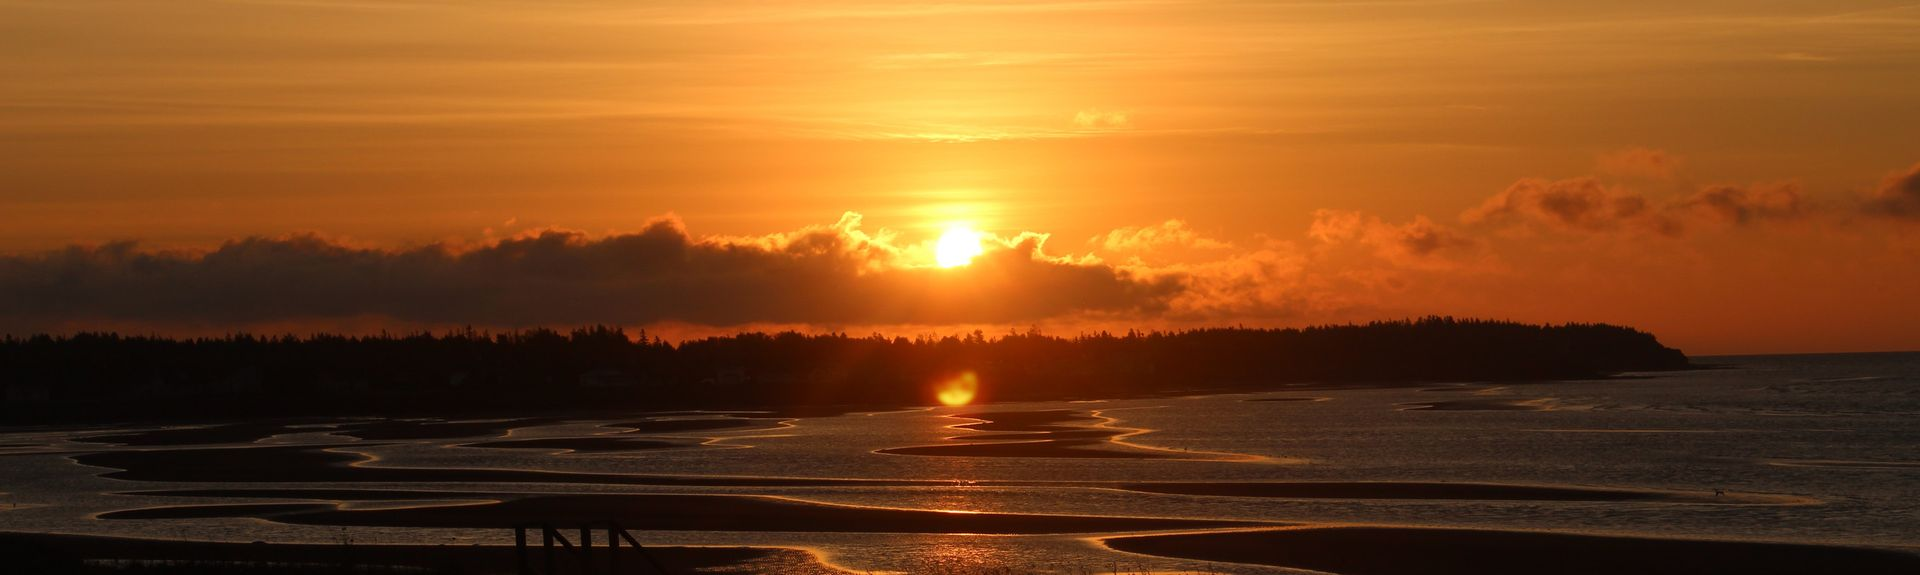 Linkletter Provincial Park, Summerside, Prince Edwardøyene, Canada